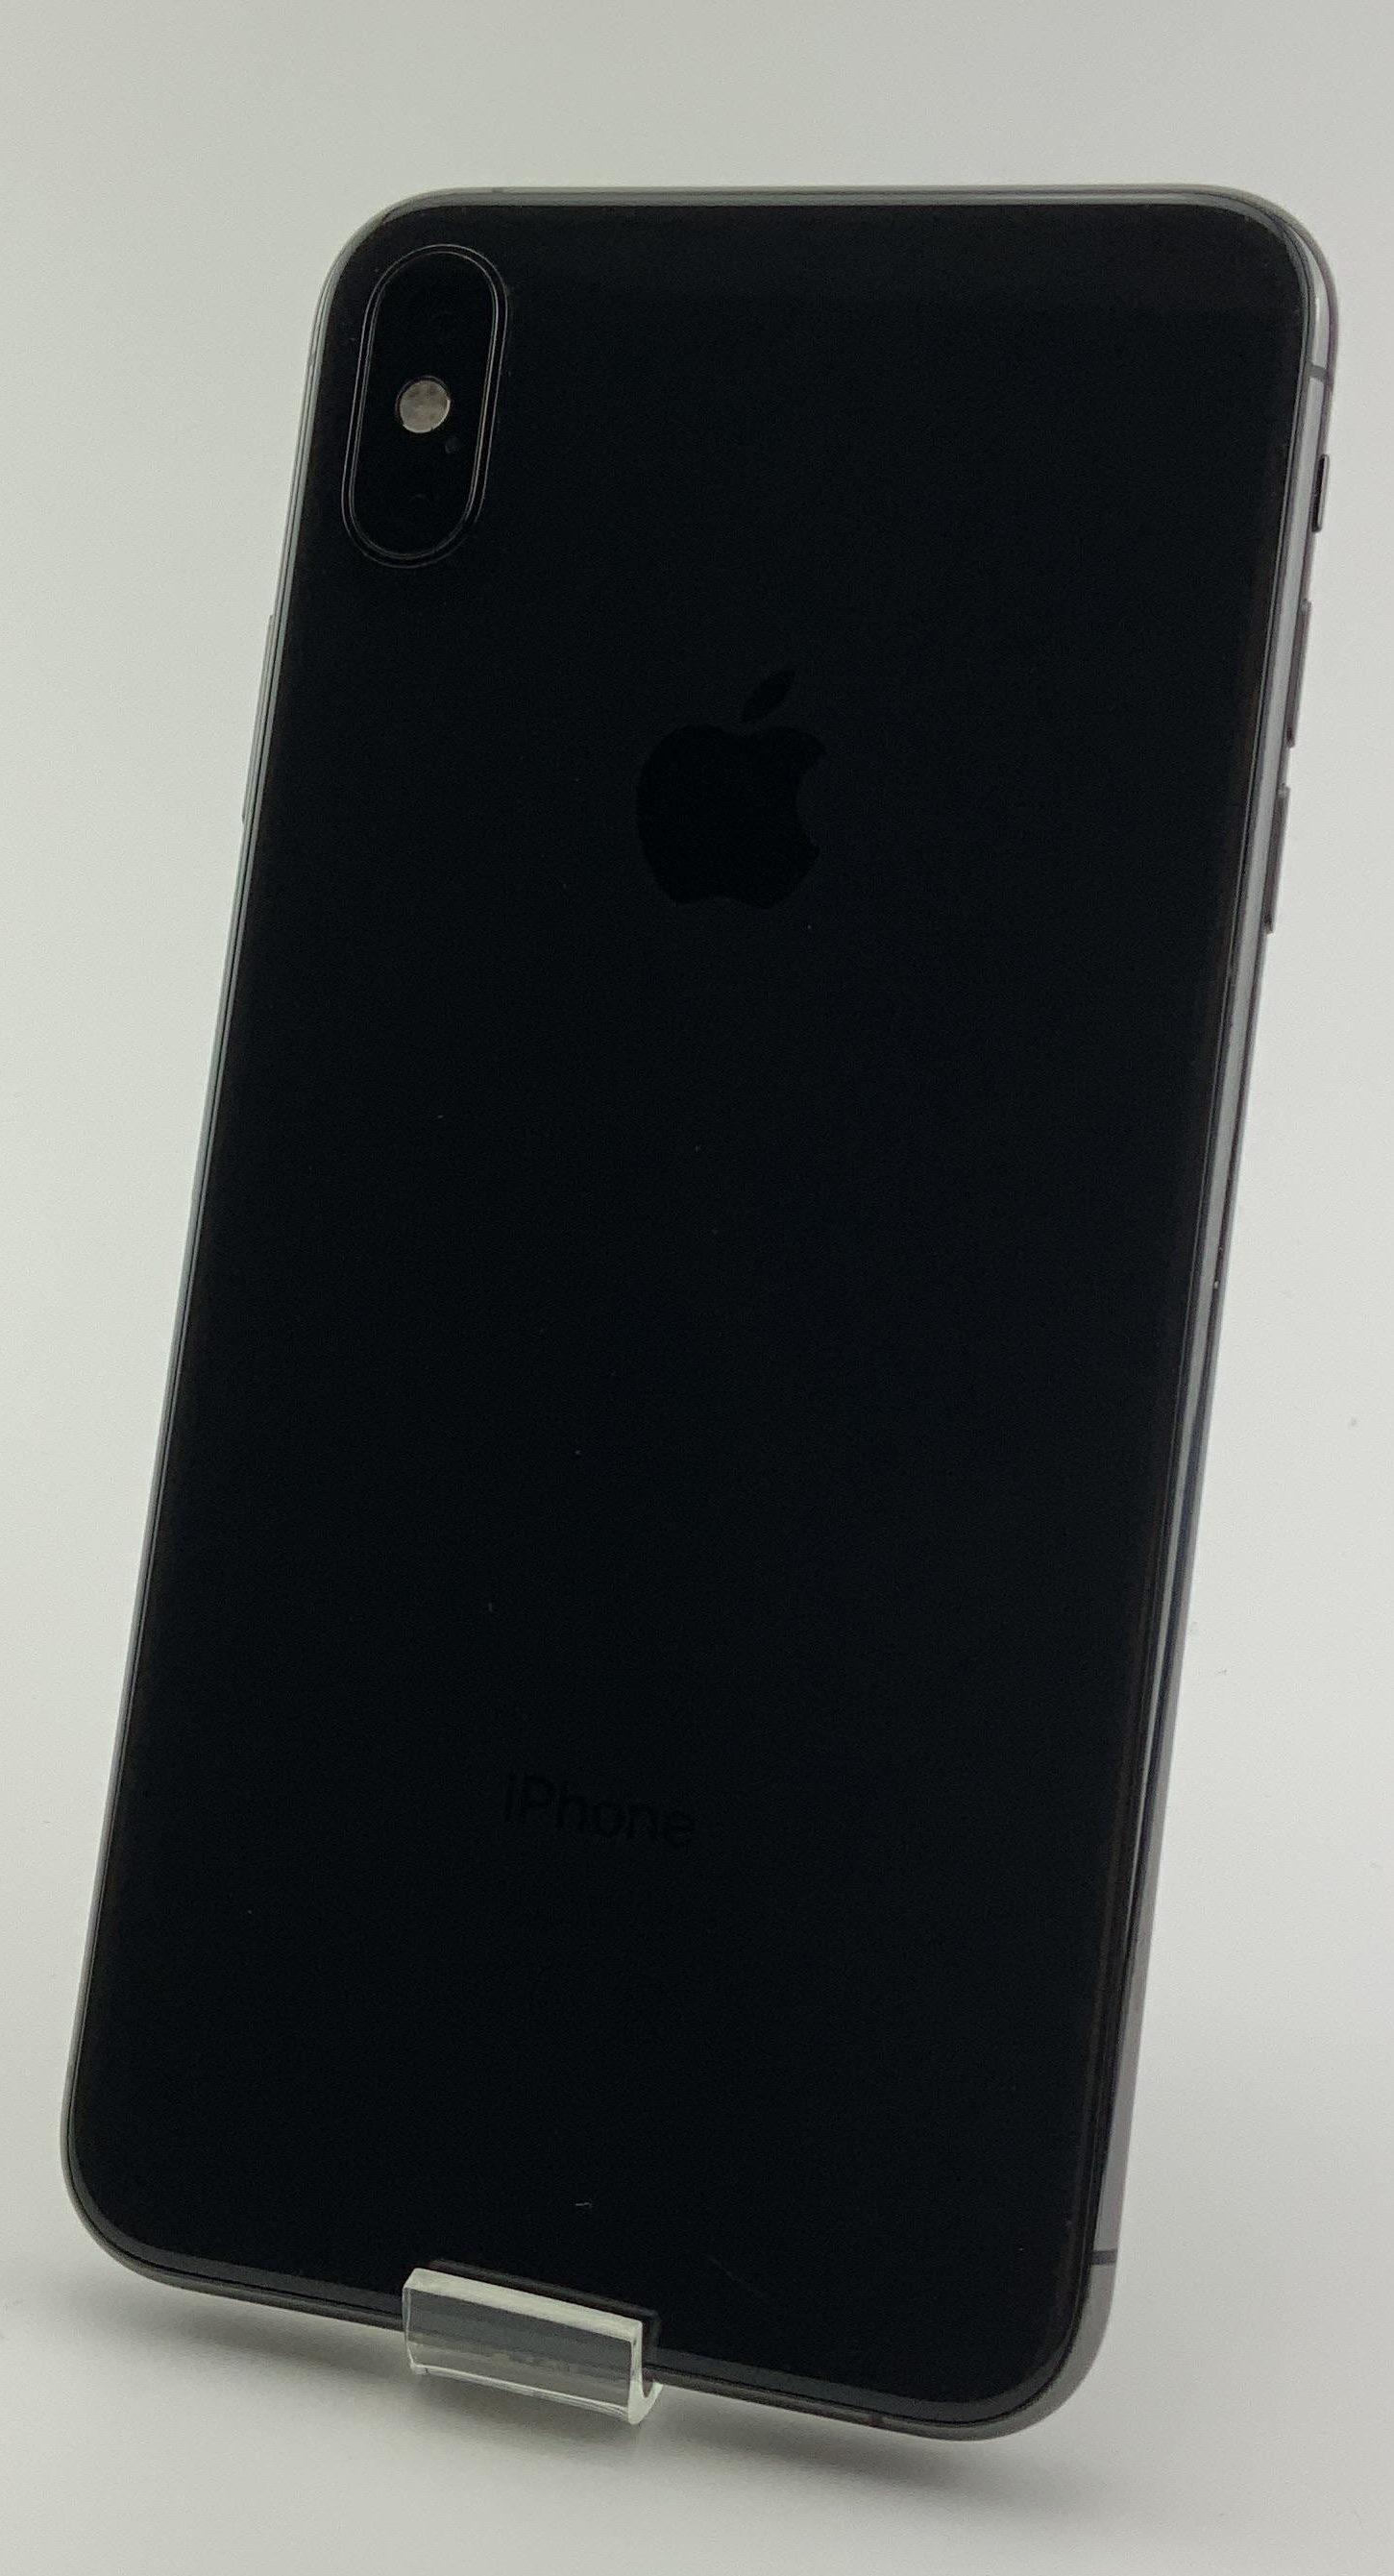 iPhone XS Max 64GB, 64GB, Space Gray, Bild 2